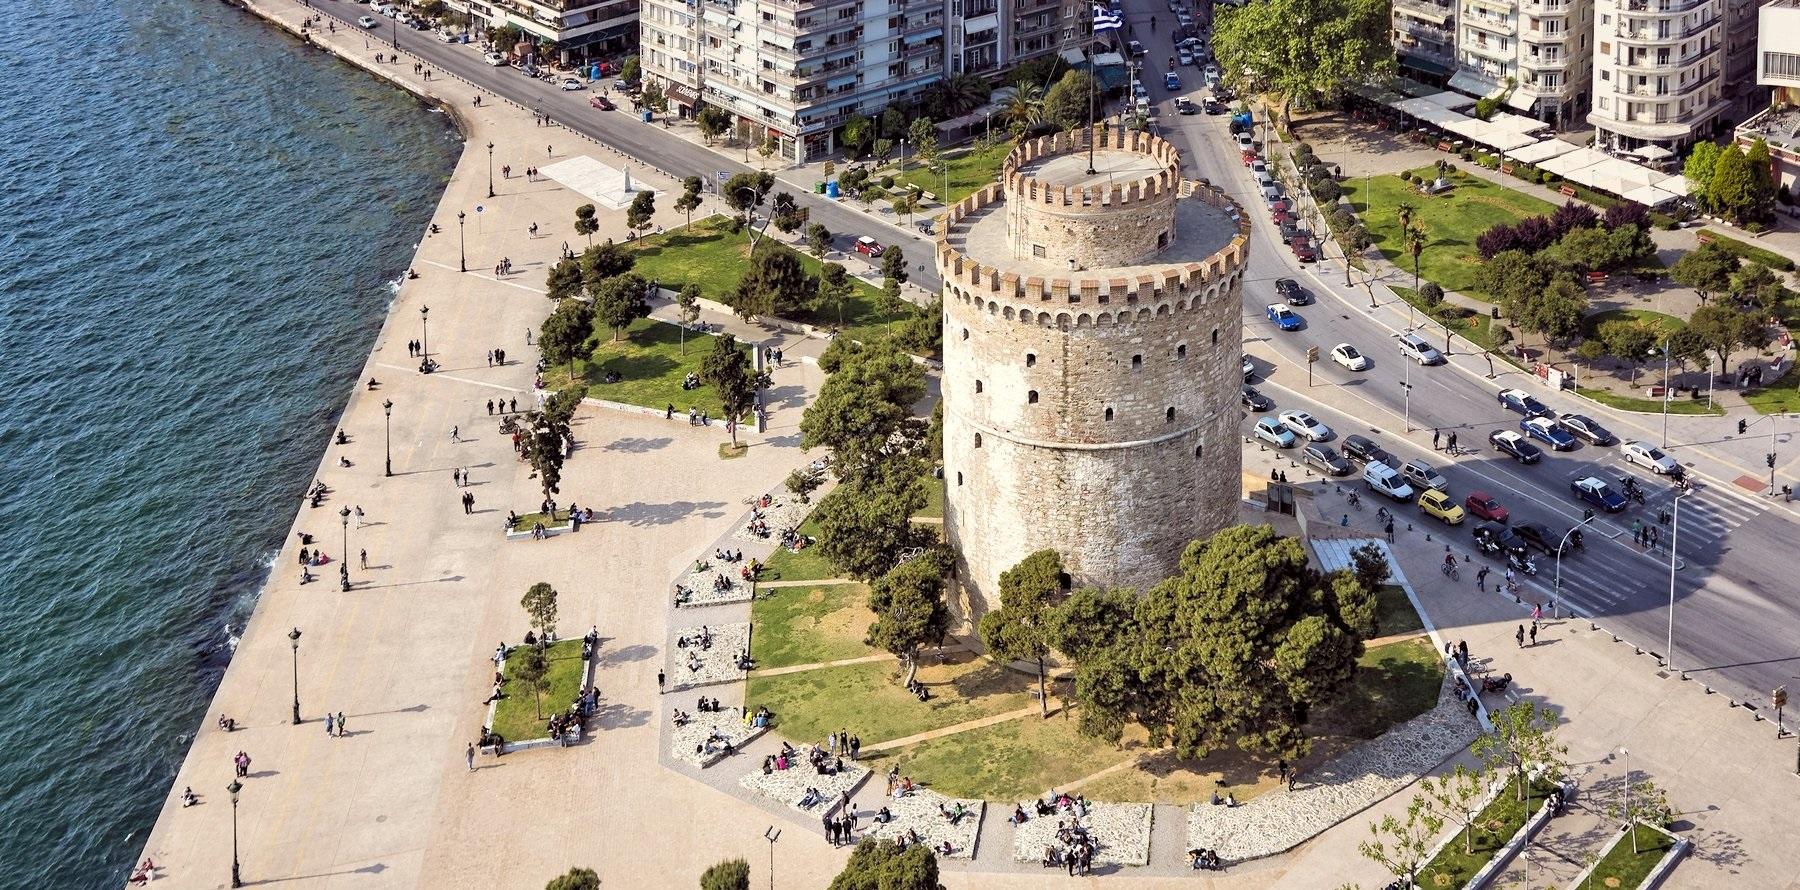 WordCamp Thessaloniki 2019 #WCTHESS2019